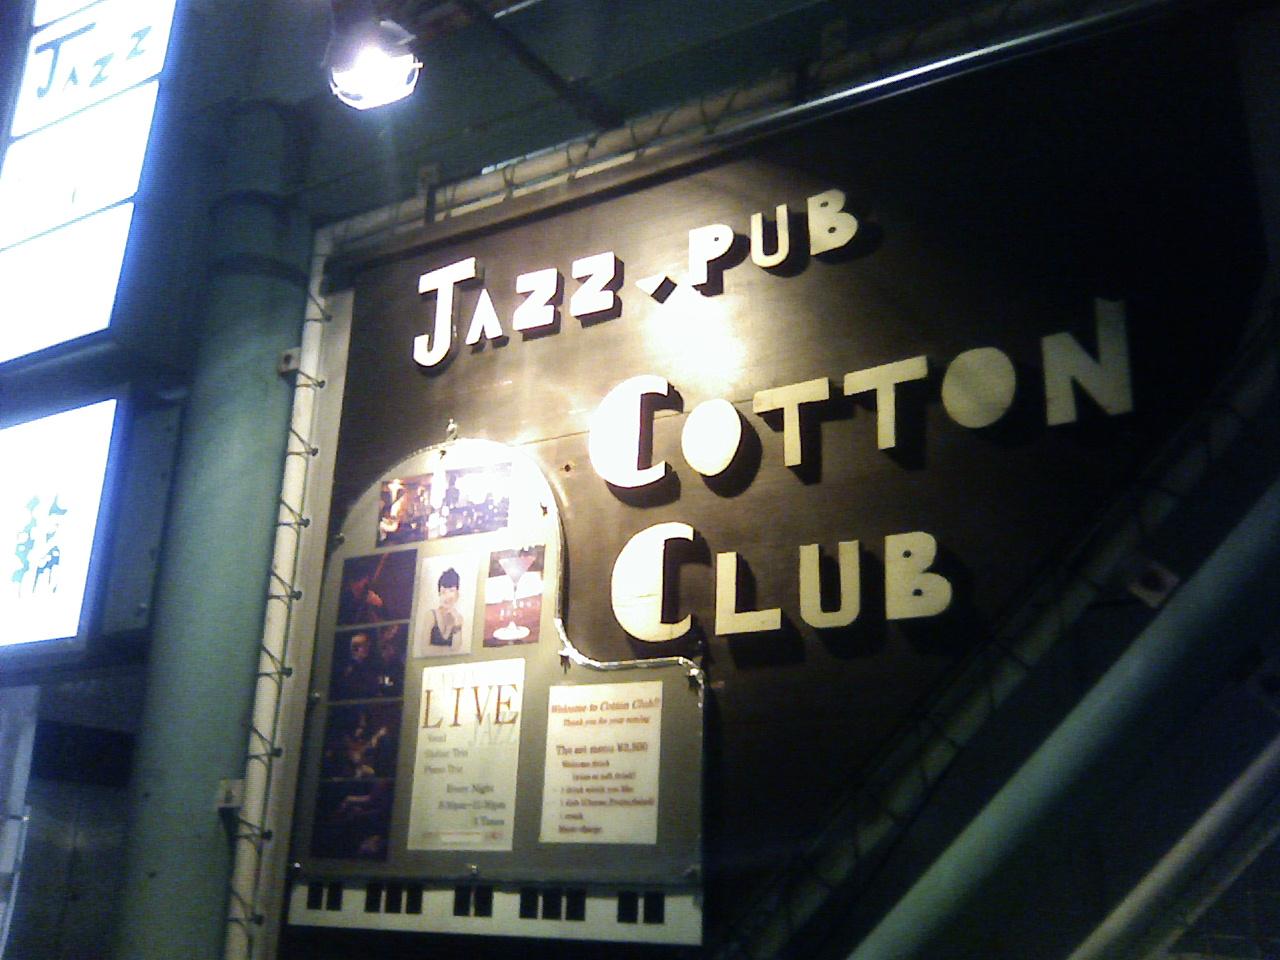 JAZZ&PUB COTTON CLUB